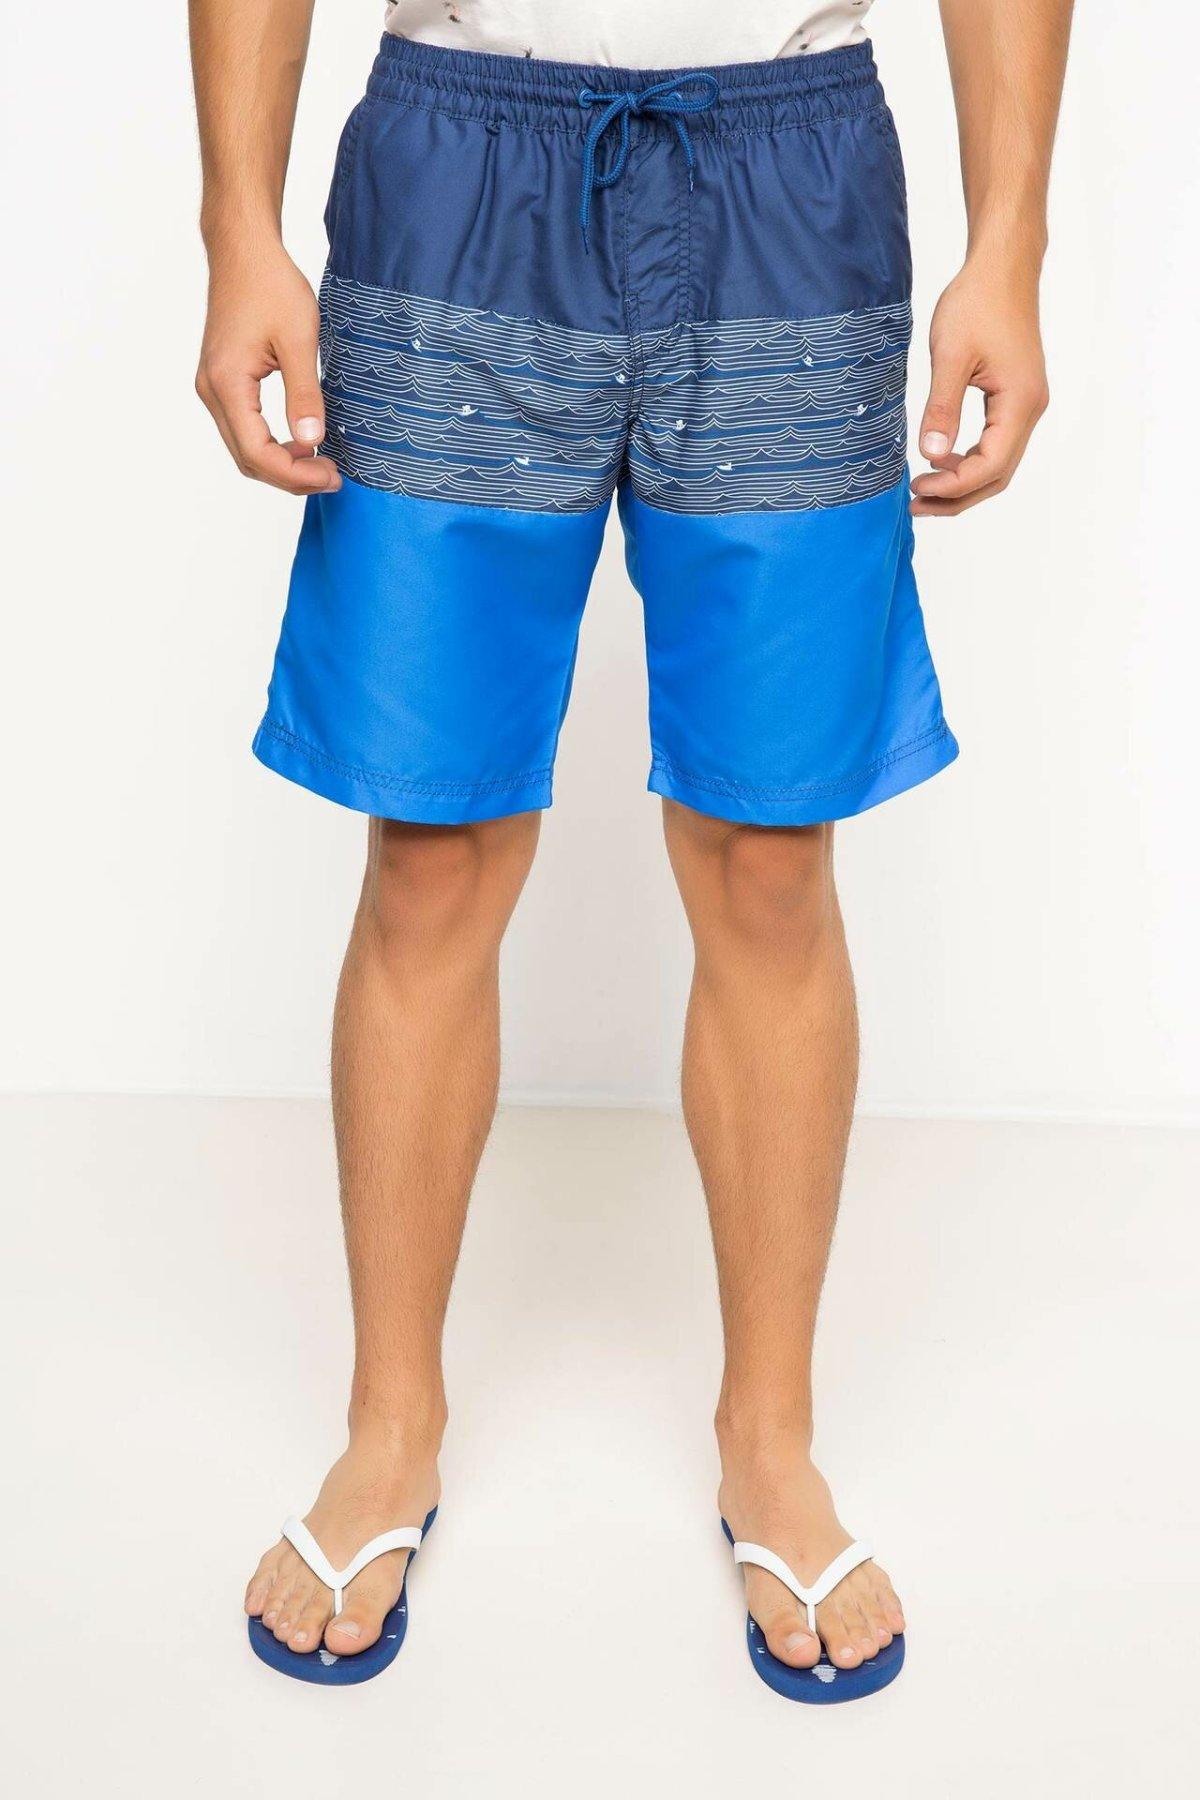 DeFacto Summer Man Woven Swimming Short Male Patchwork Drawstring Shorts Casual Beach Holiday New - G7292AZ17HS